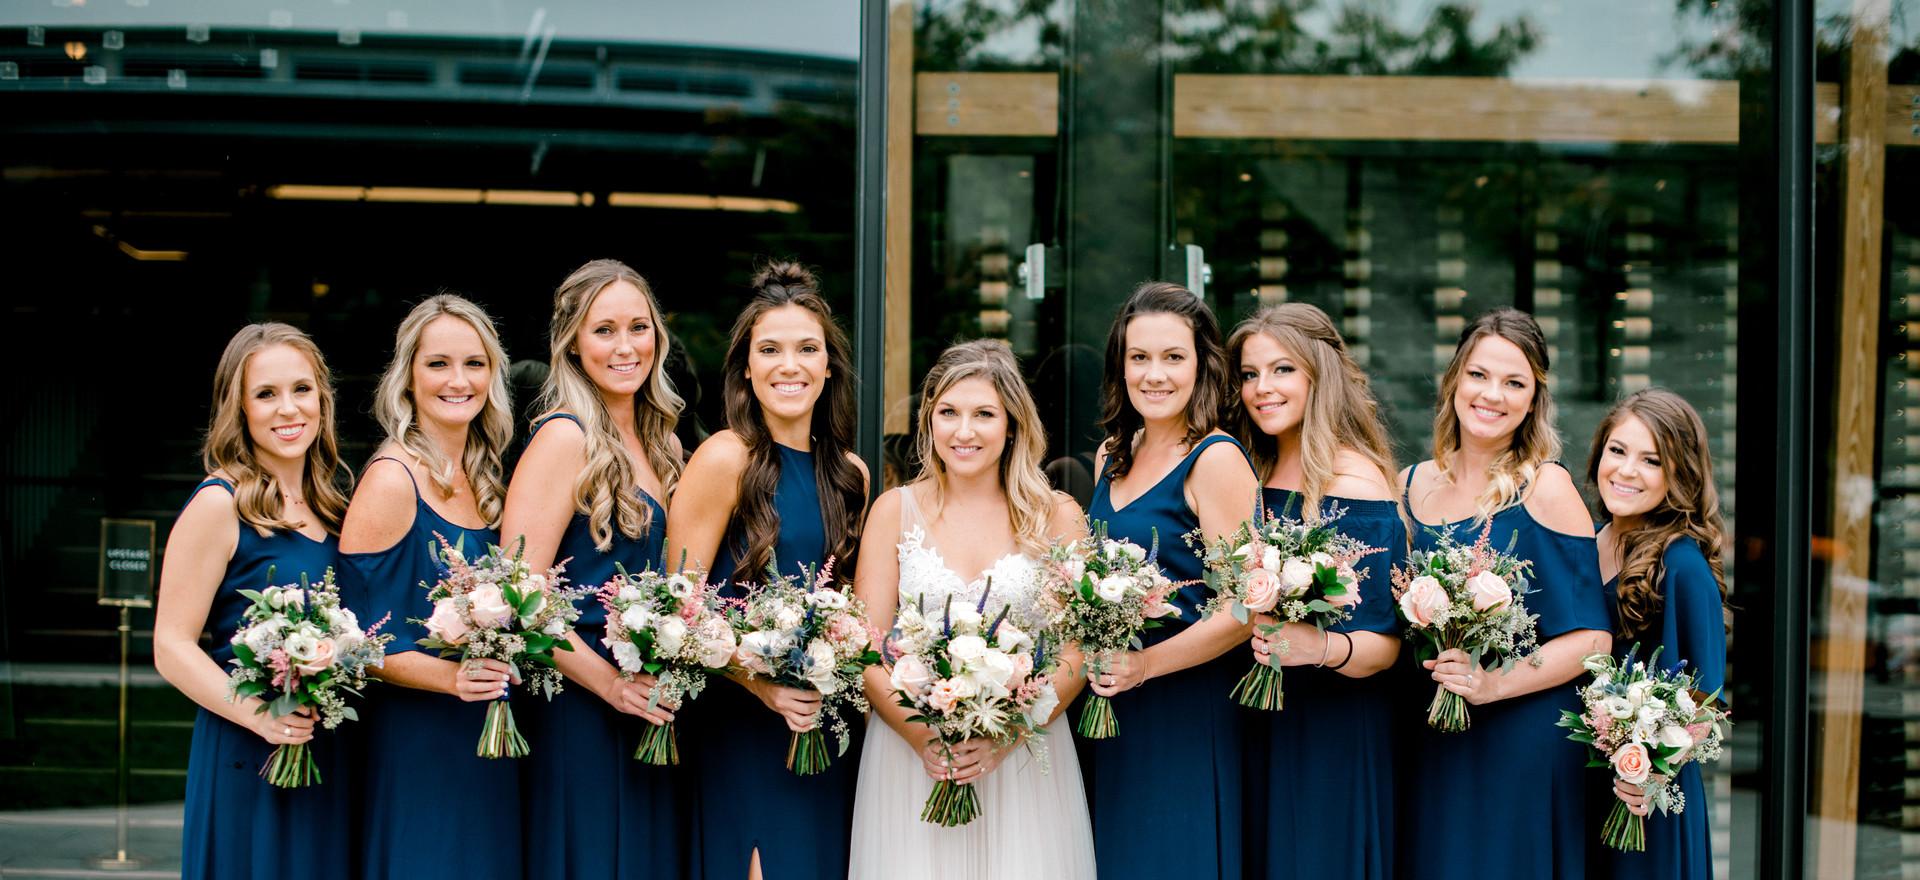 Allie and Bridesmaids.jpg